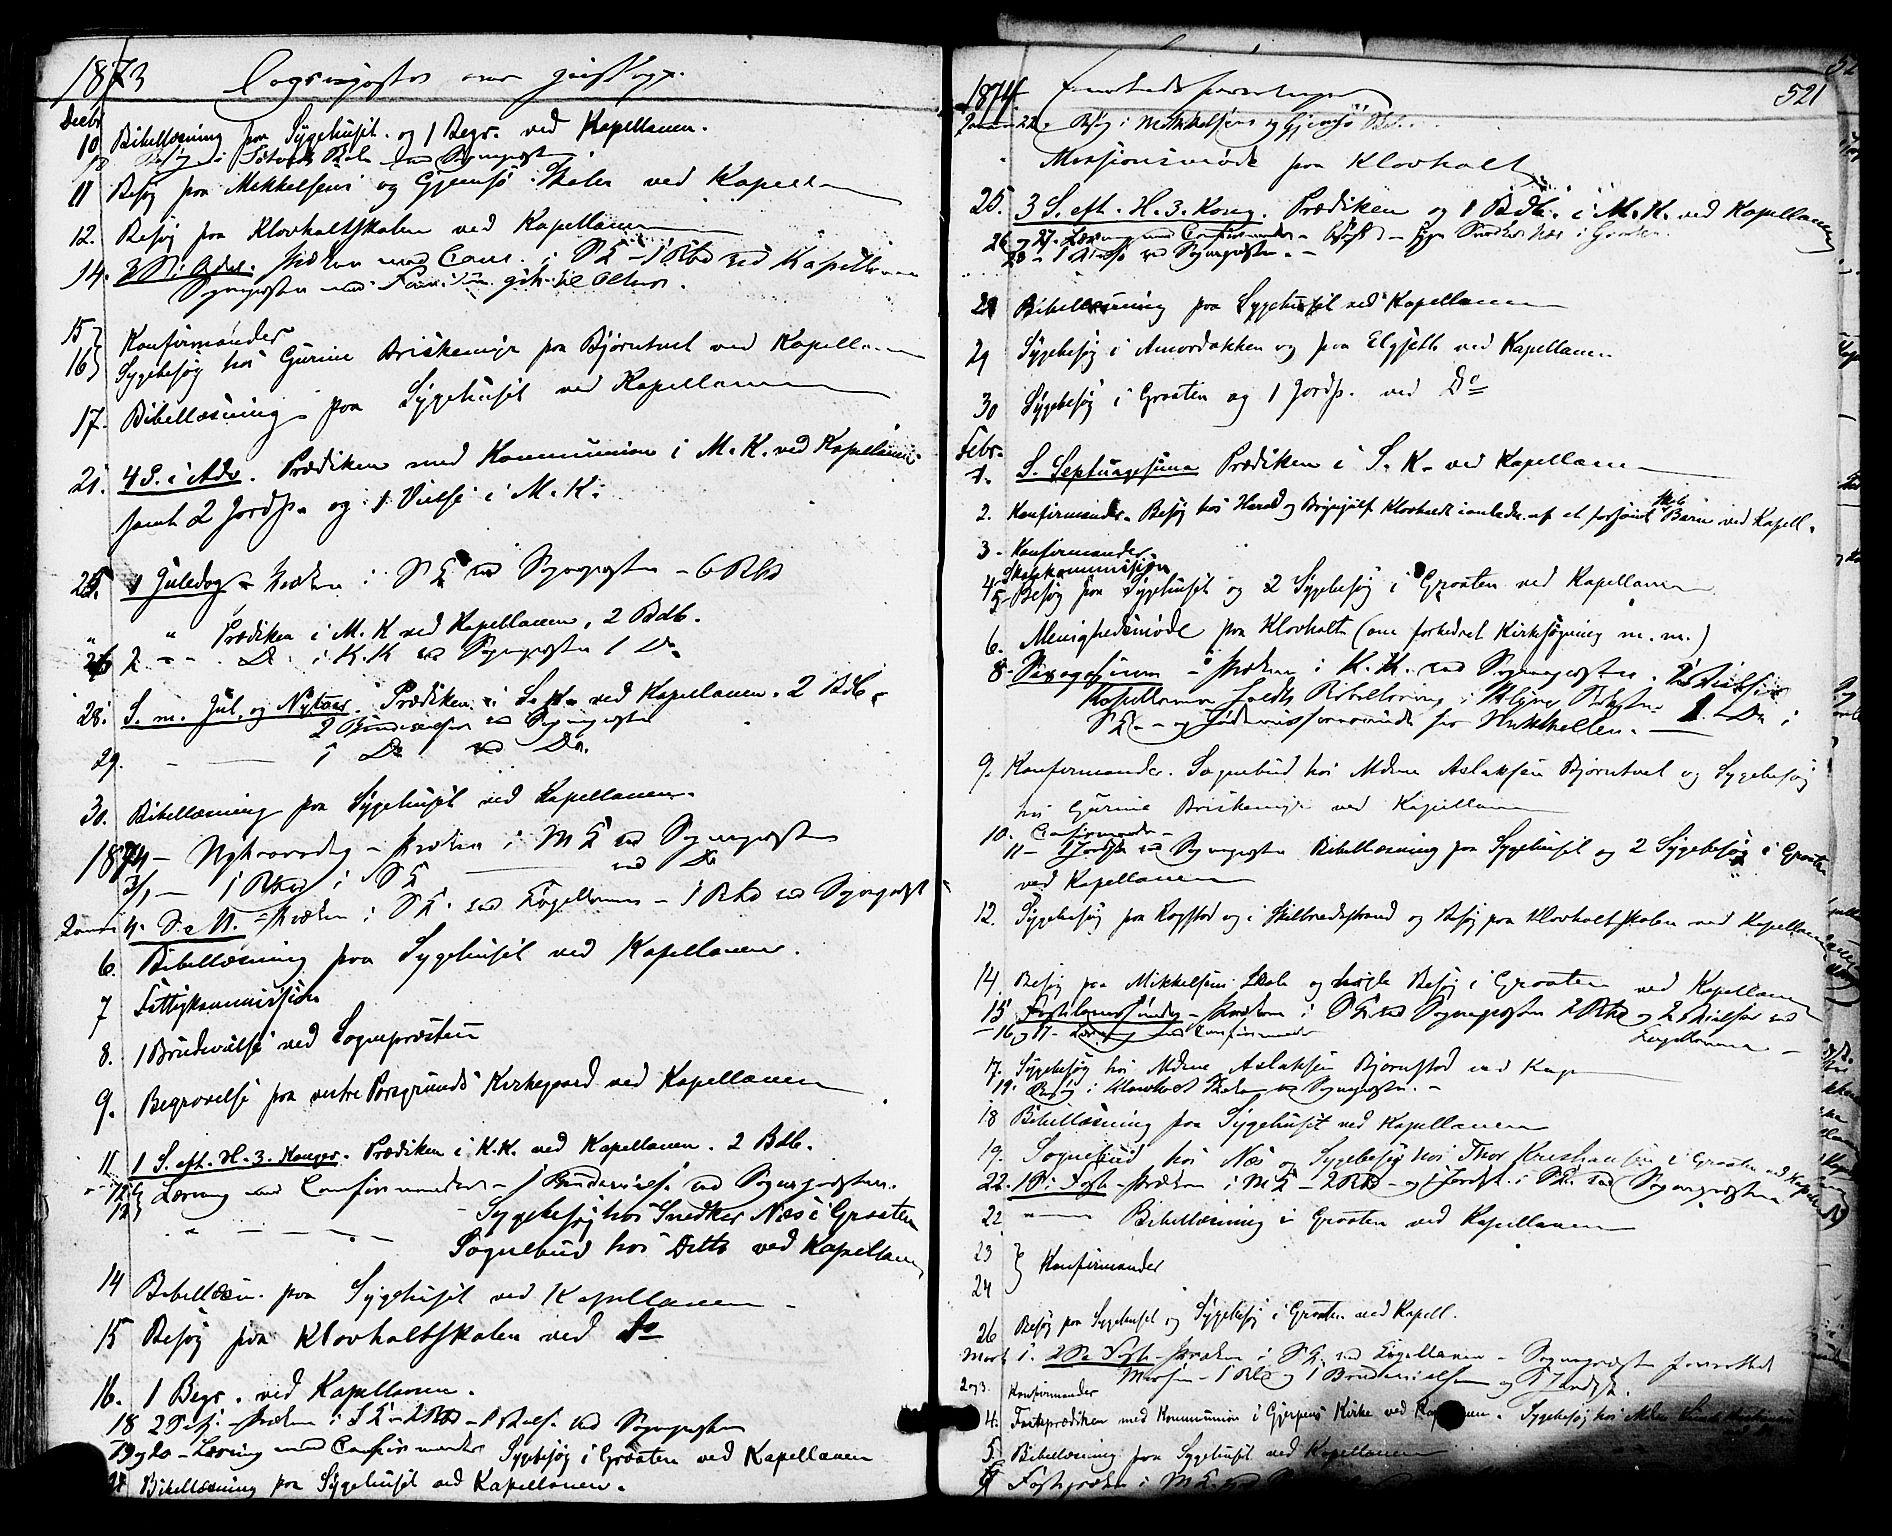 SAKO, Solum kirkebøker, F/Fa/L0008: Ministerialbok nr. I 8, 1865-1876, s. 521